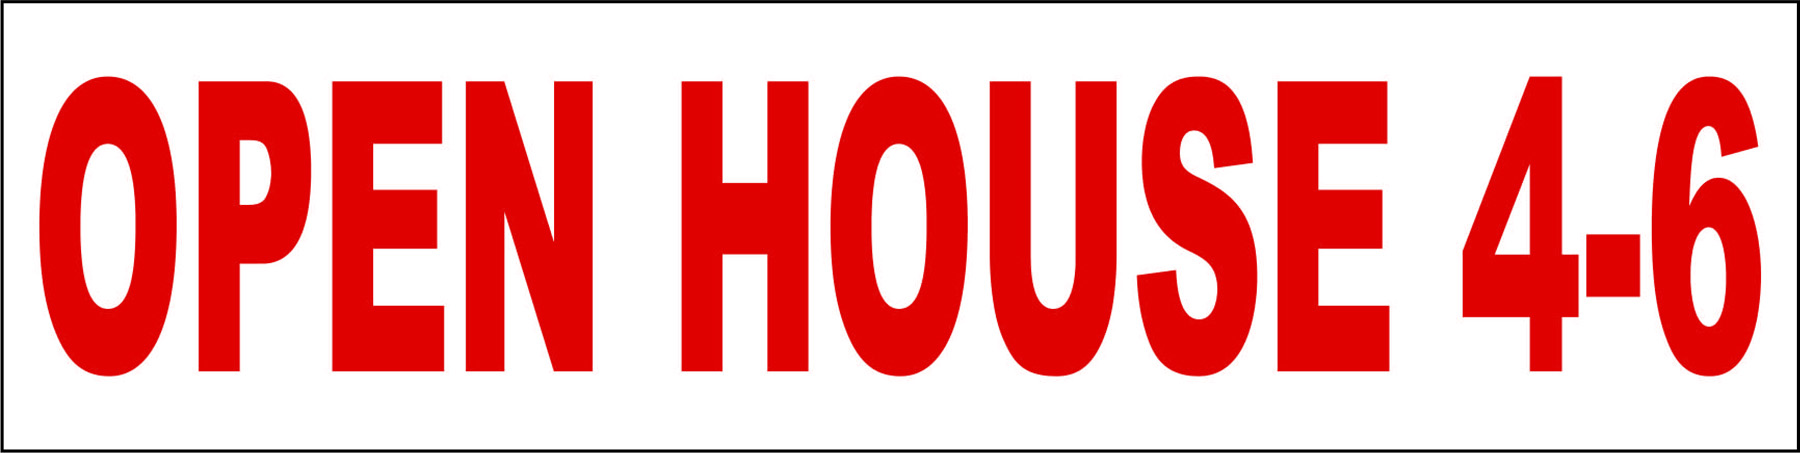 Open House 4-6